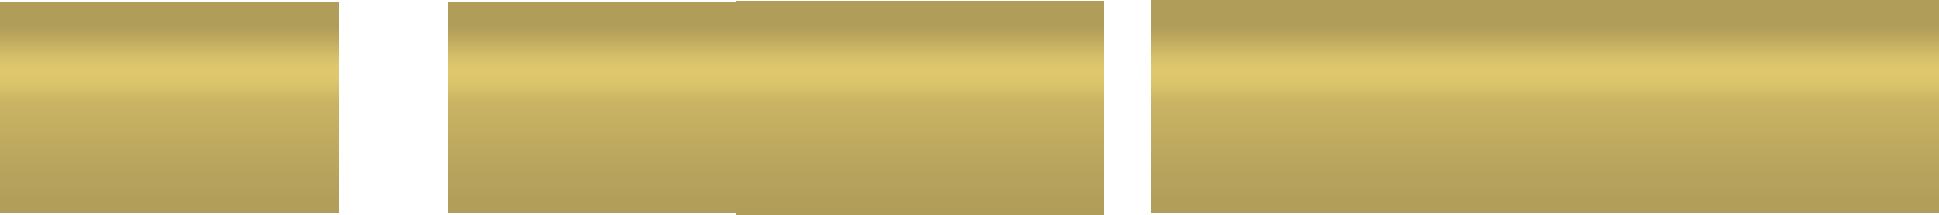 lindsay giguiere, feravana, logo